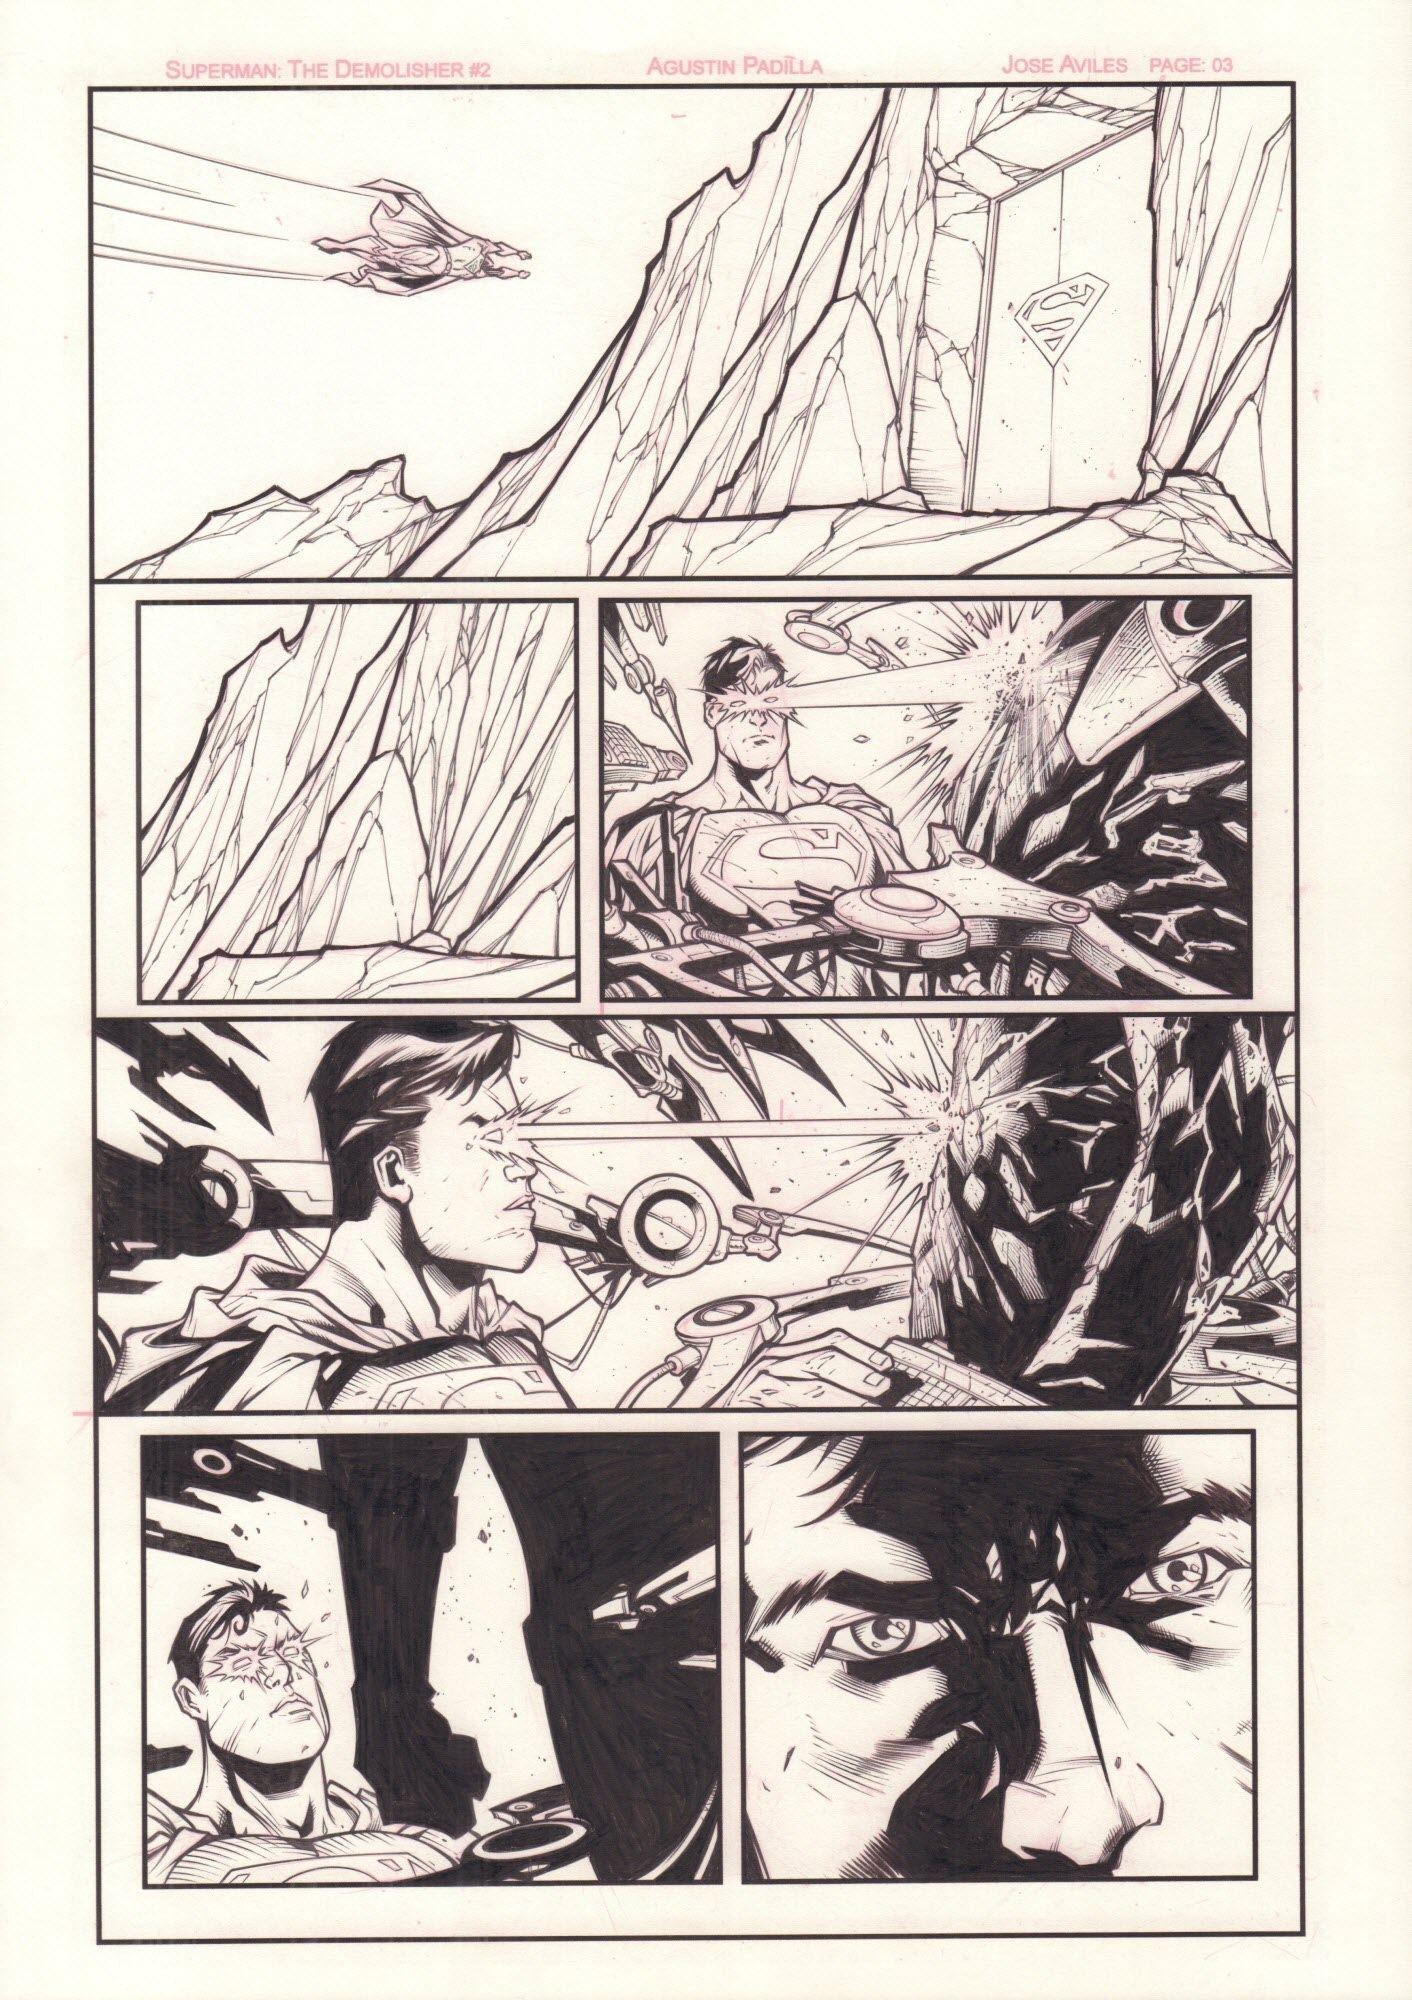 Adventures of Superman #36 / 3